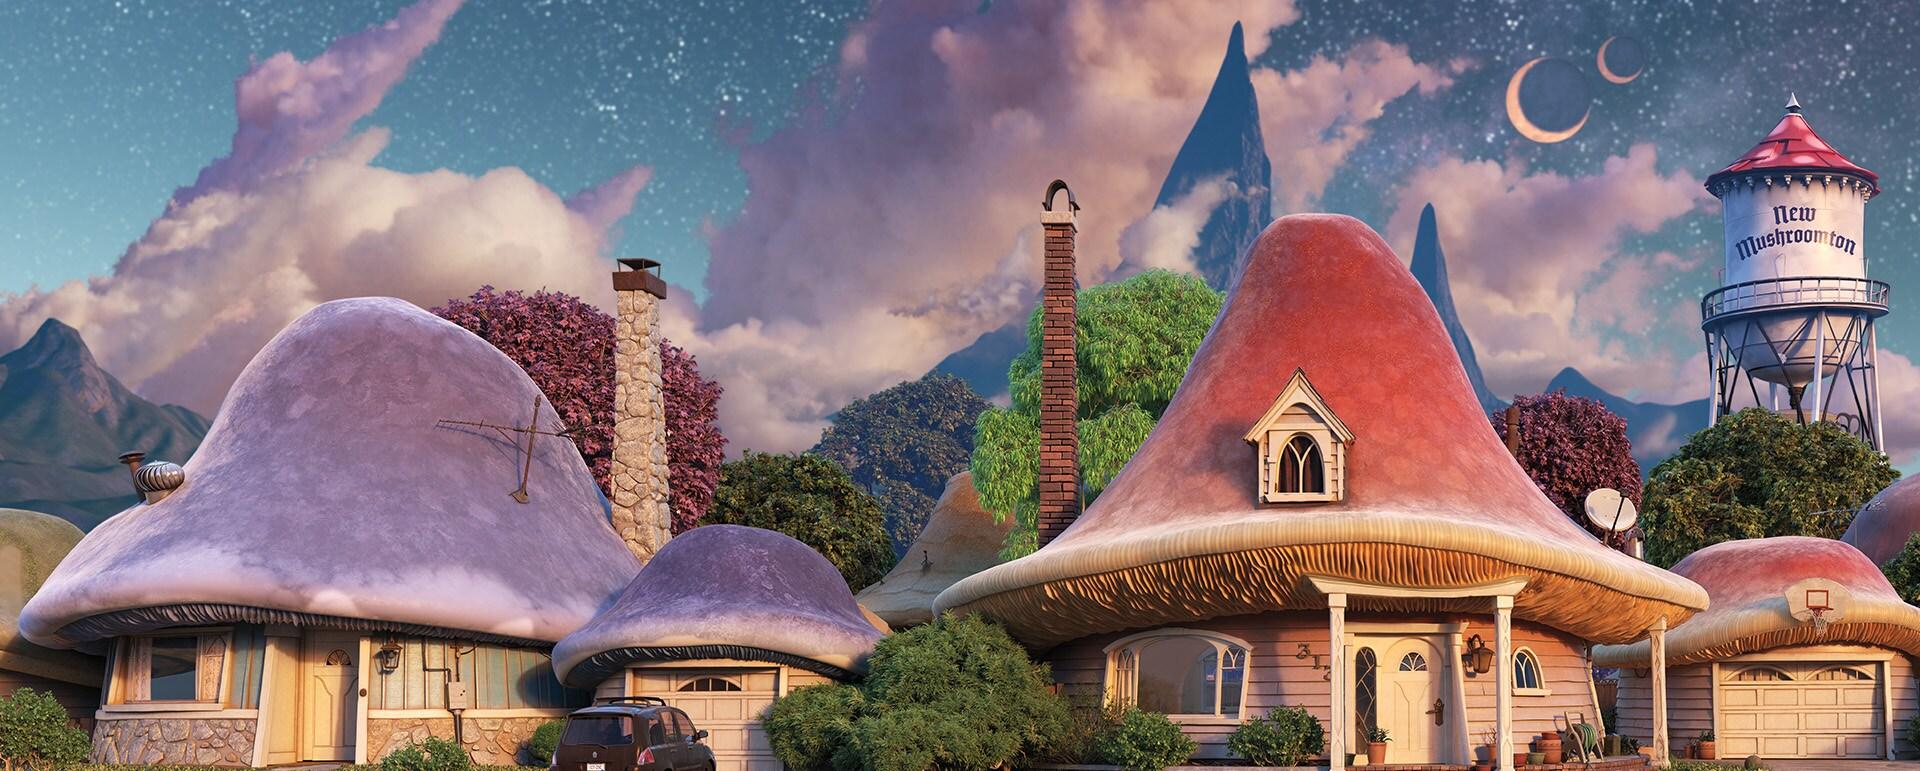 new mushroomton from Pixar's onward